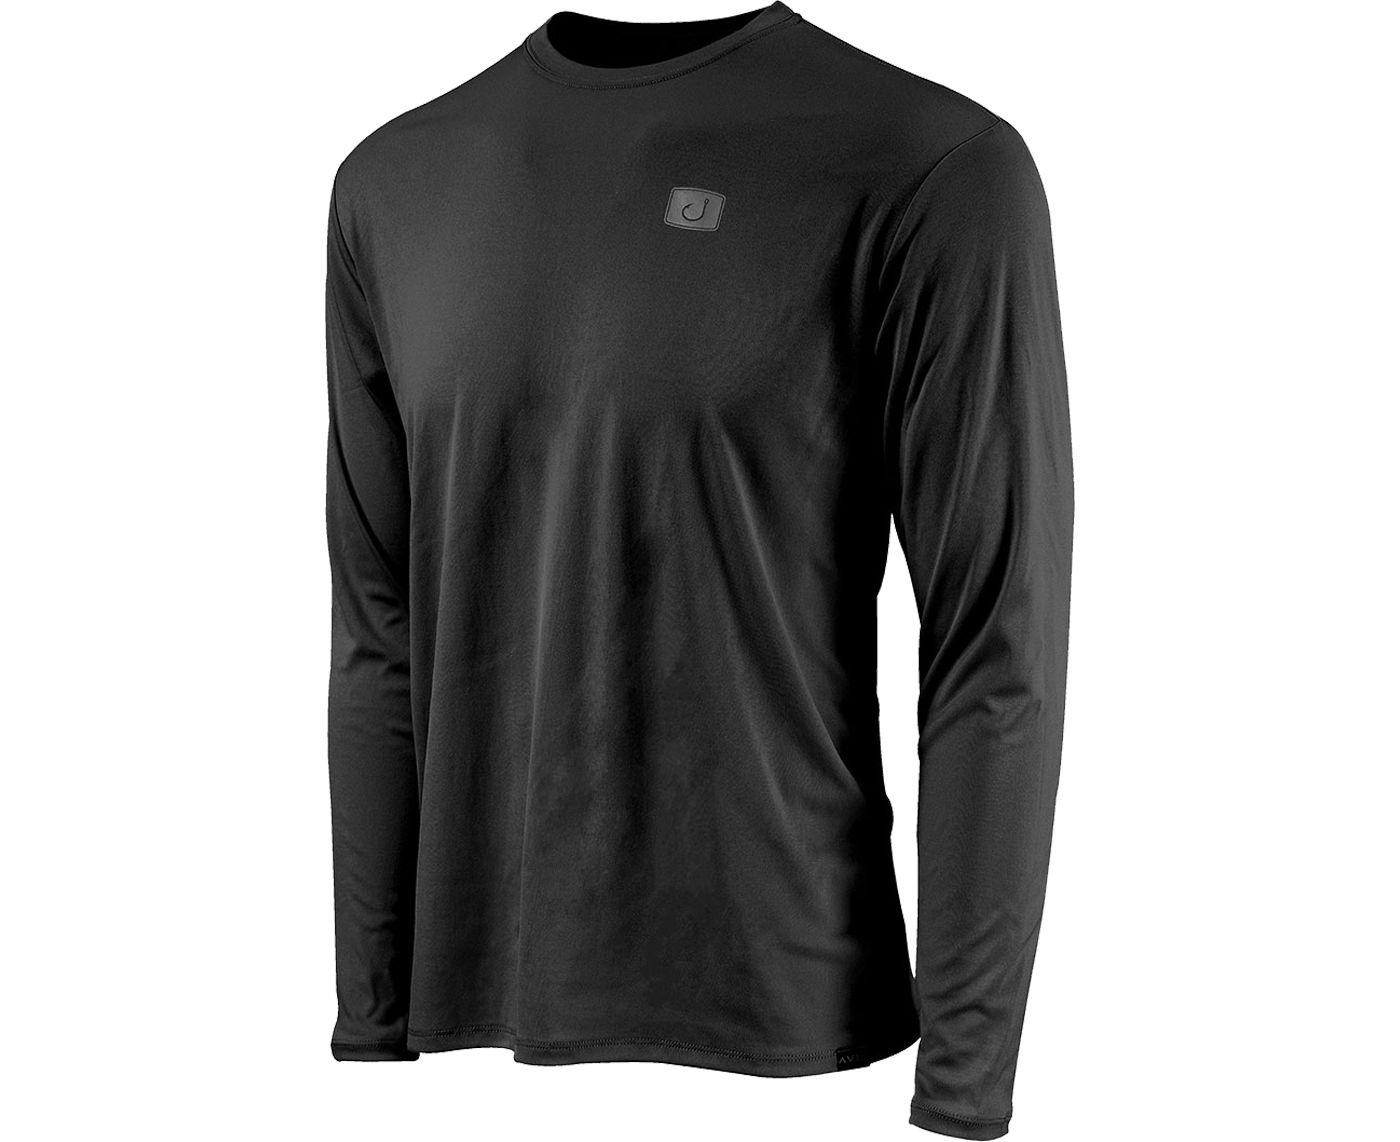 AVID Men's Core AVIDry Long Sleeve Performance Shirt